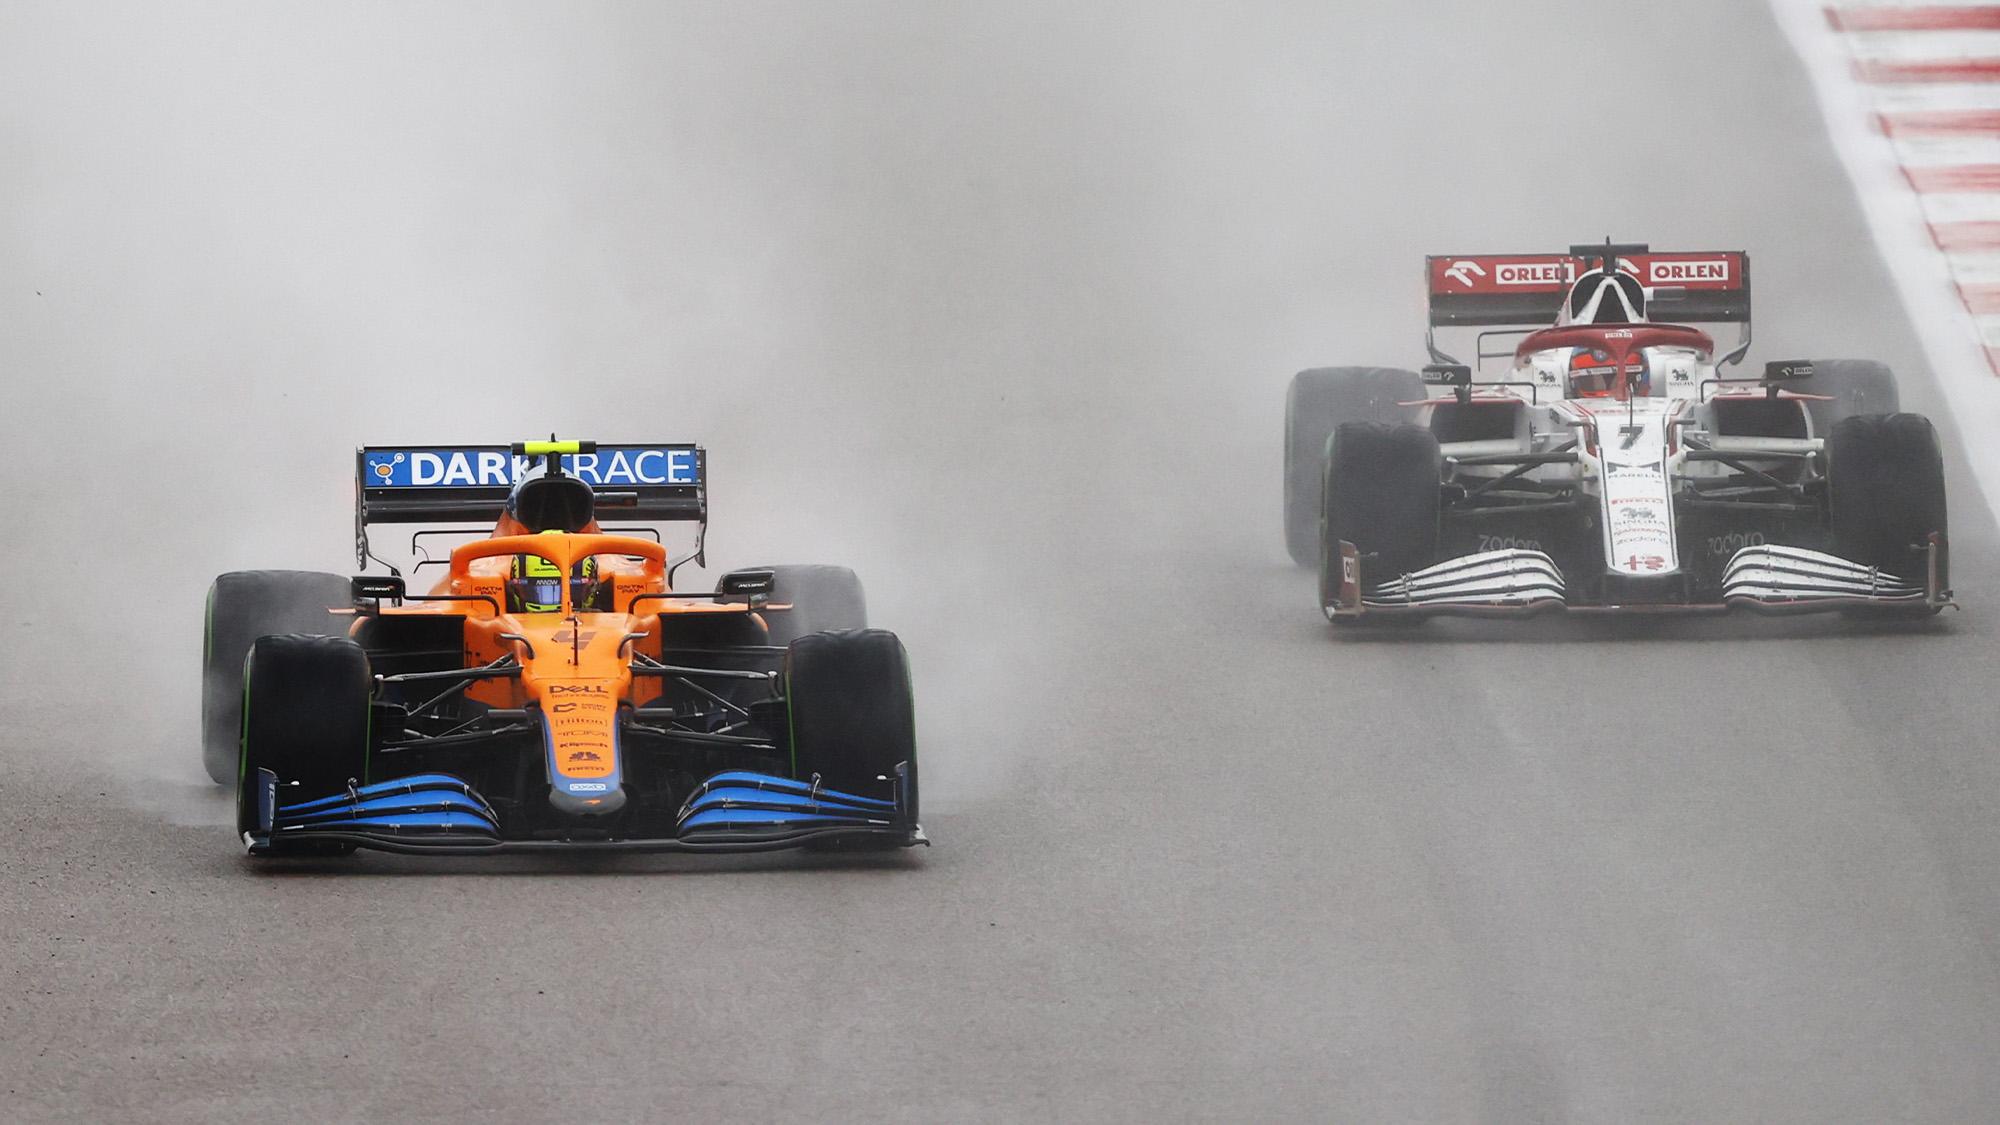 Lando Norris goes past Kimi Raikkonen in the rain at the 2021 Russian Grand Prix